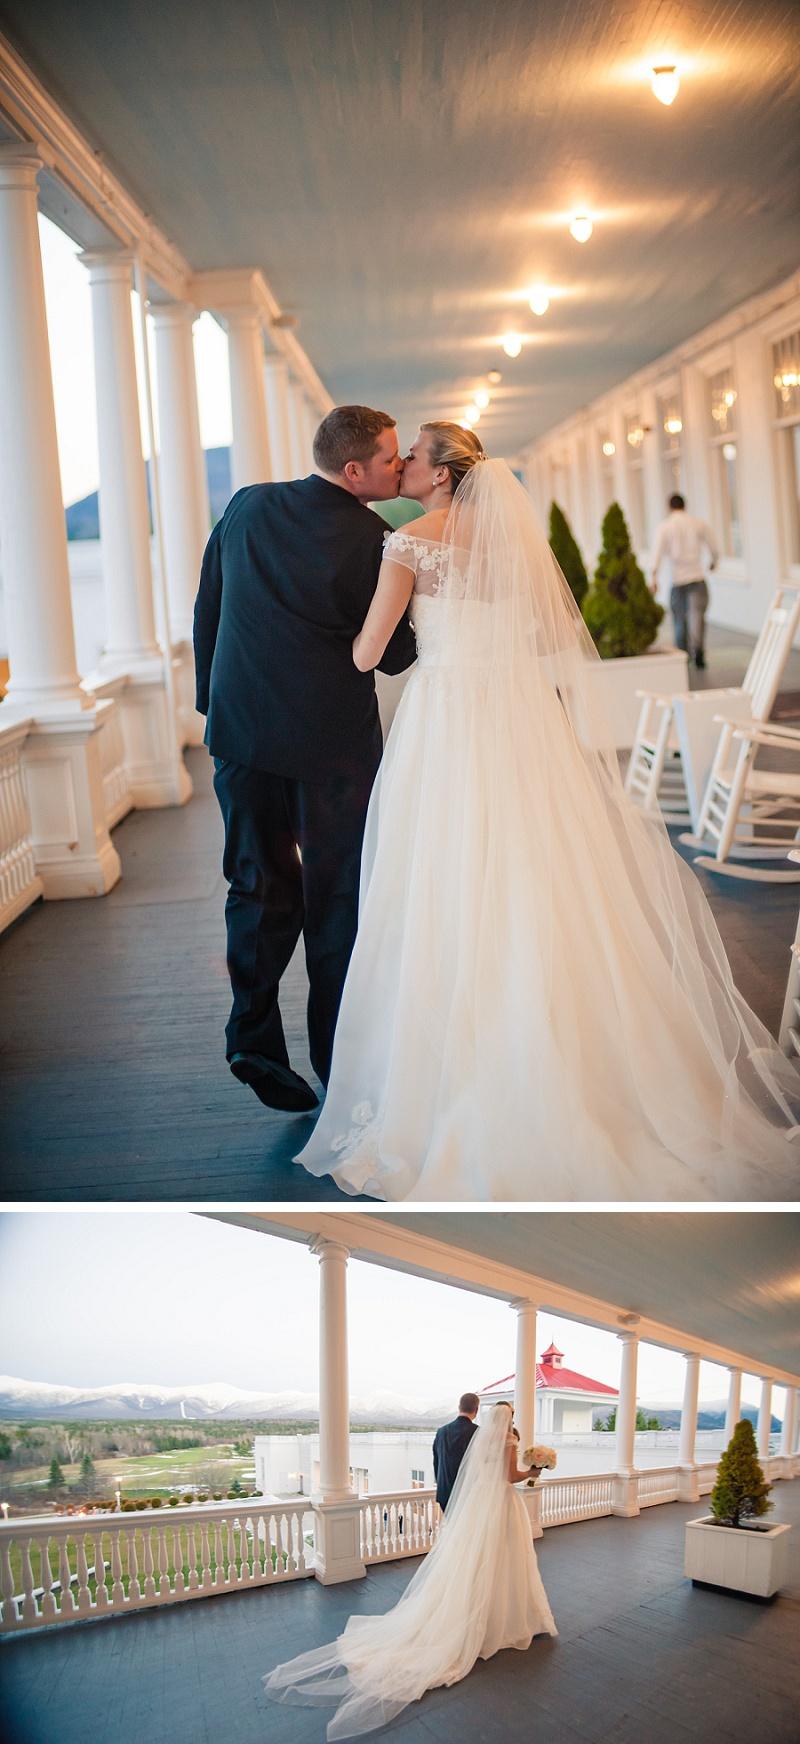 Bride and groom walking on the veranda of the Mount Washington Hotel in winter